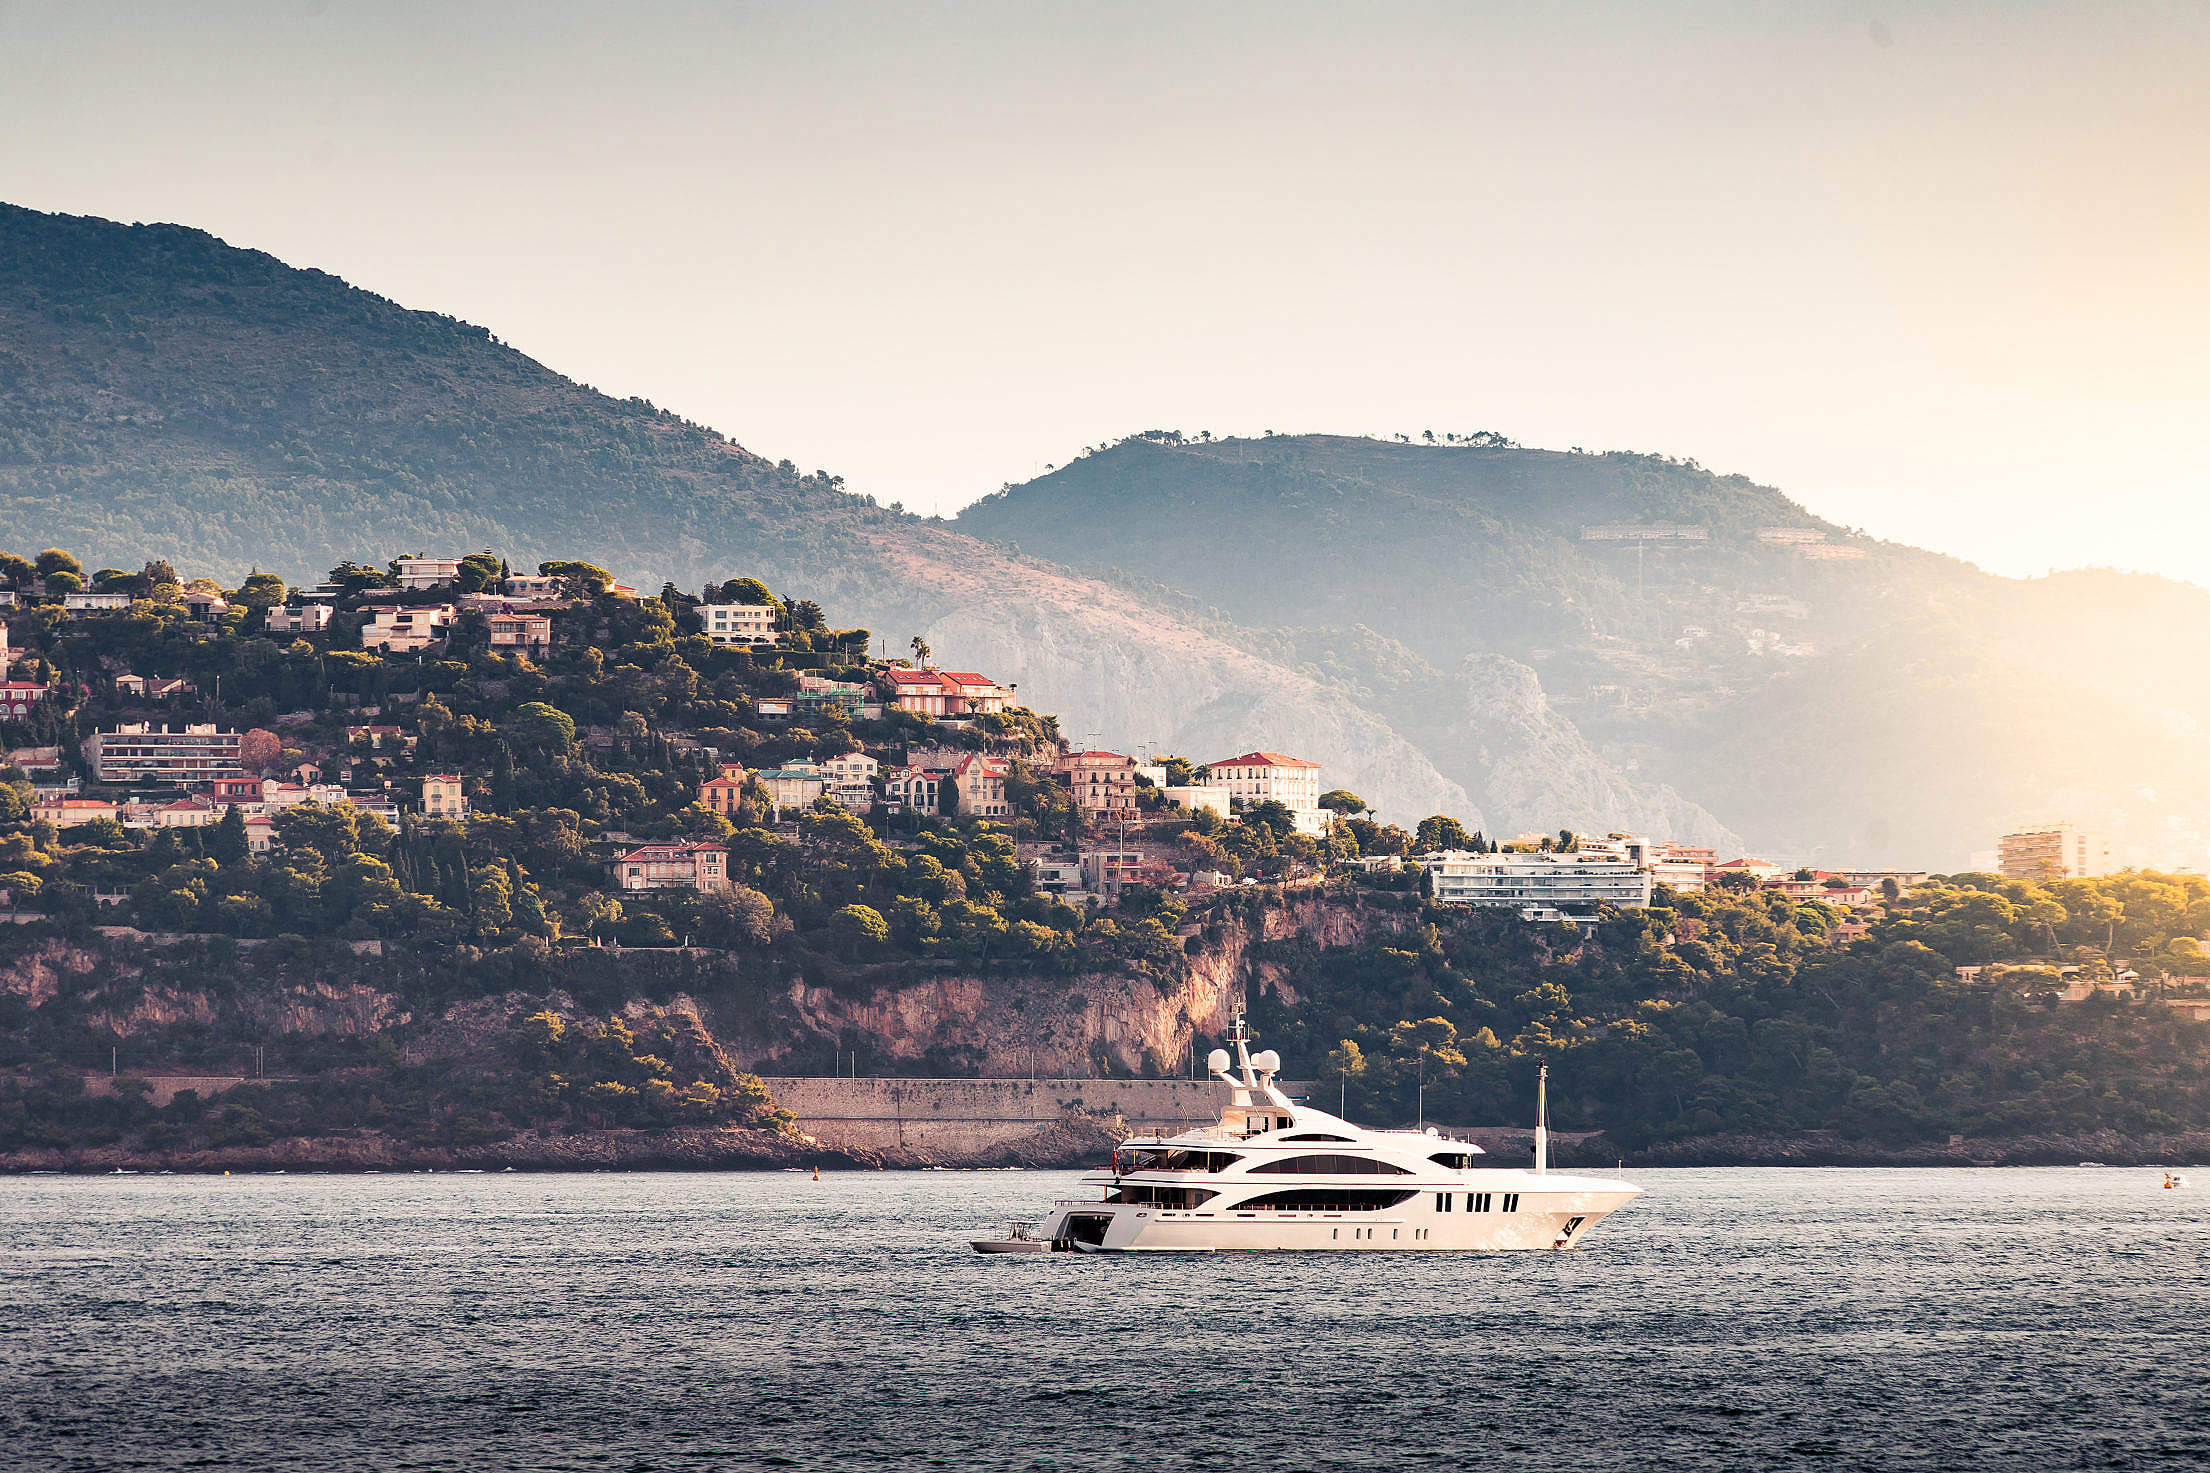 Luxury Yacht Cruising in The Bay Free Stock Photo